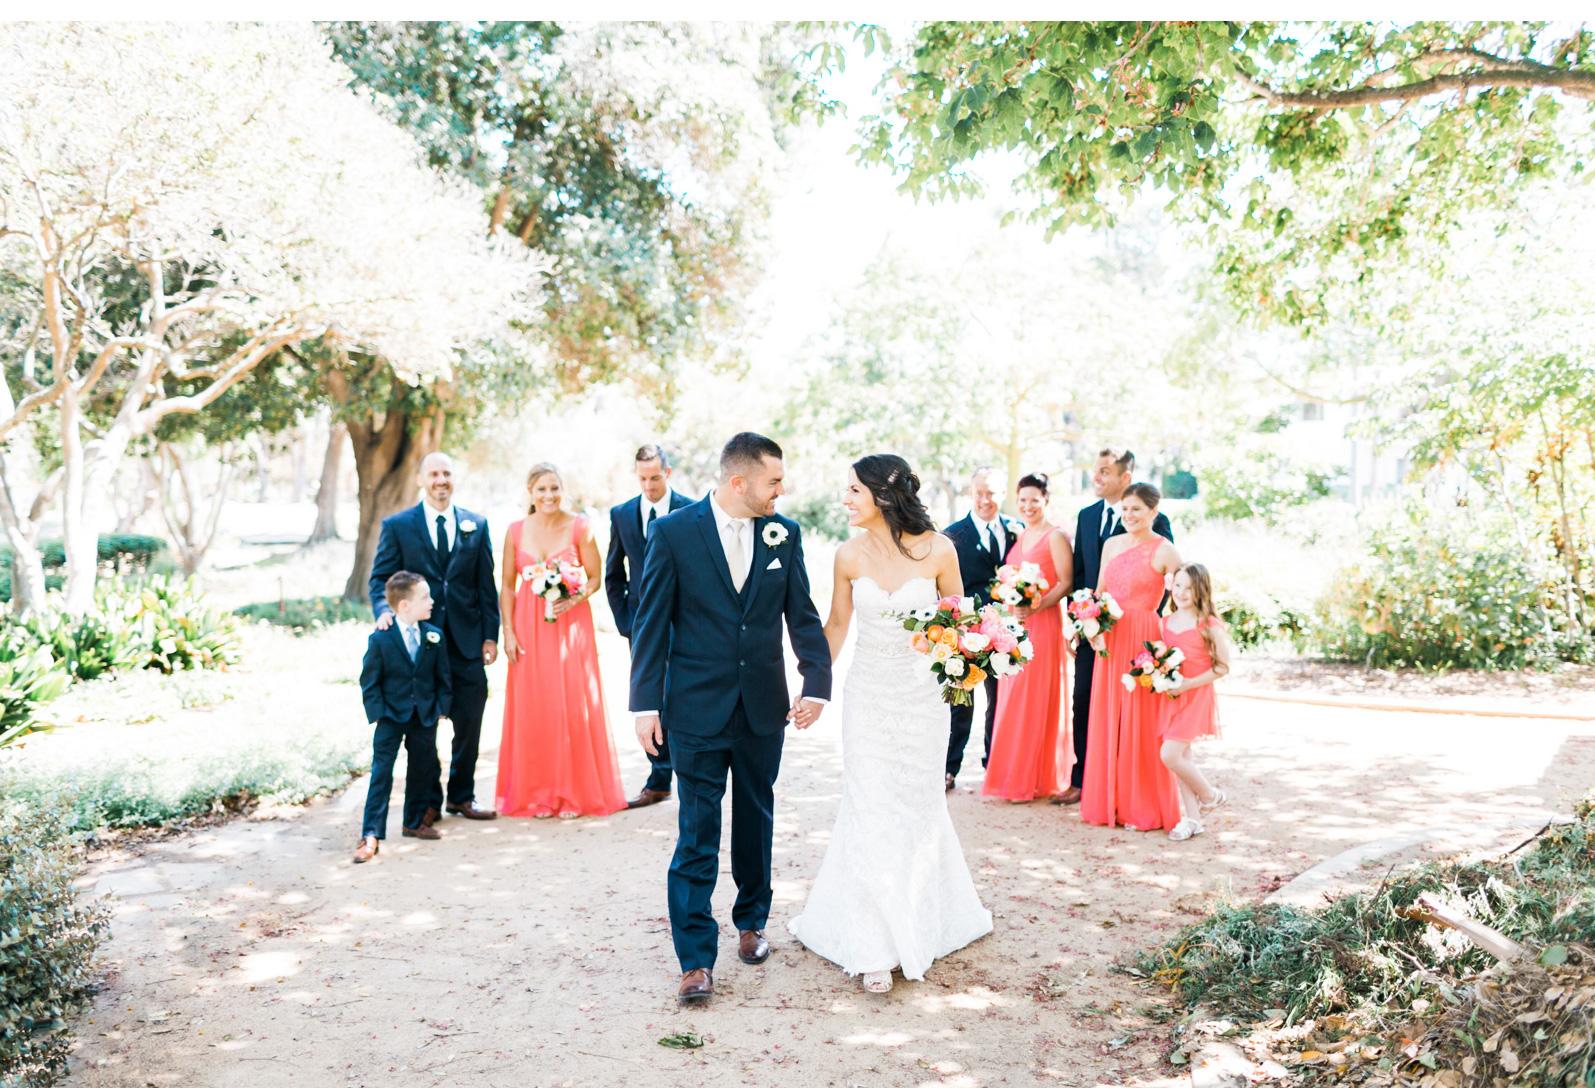 Southern-California-Santa-Barbara-Wedding-Photographer-Natalie-Schutt-Photography_13.jpg